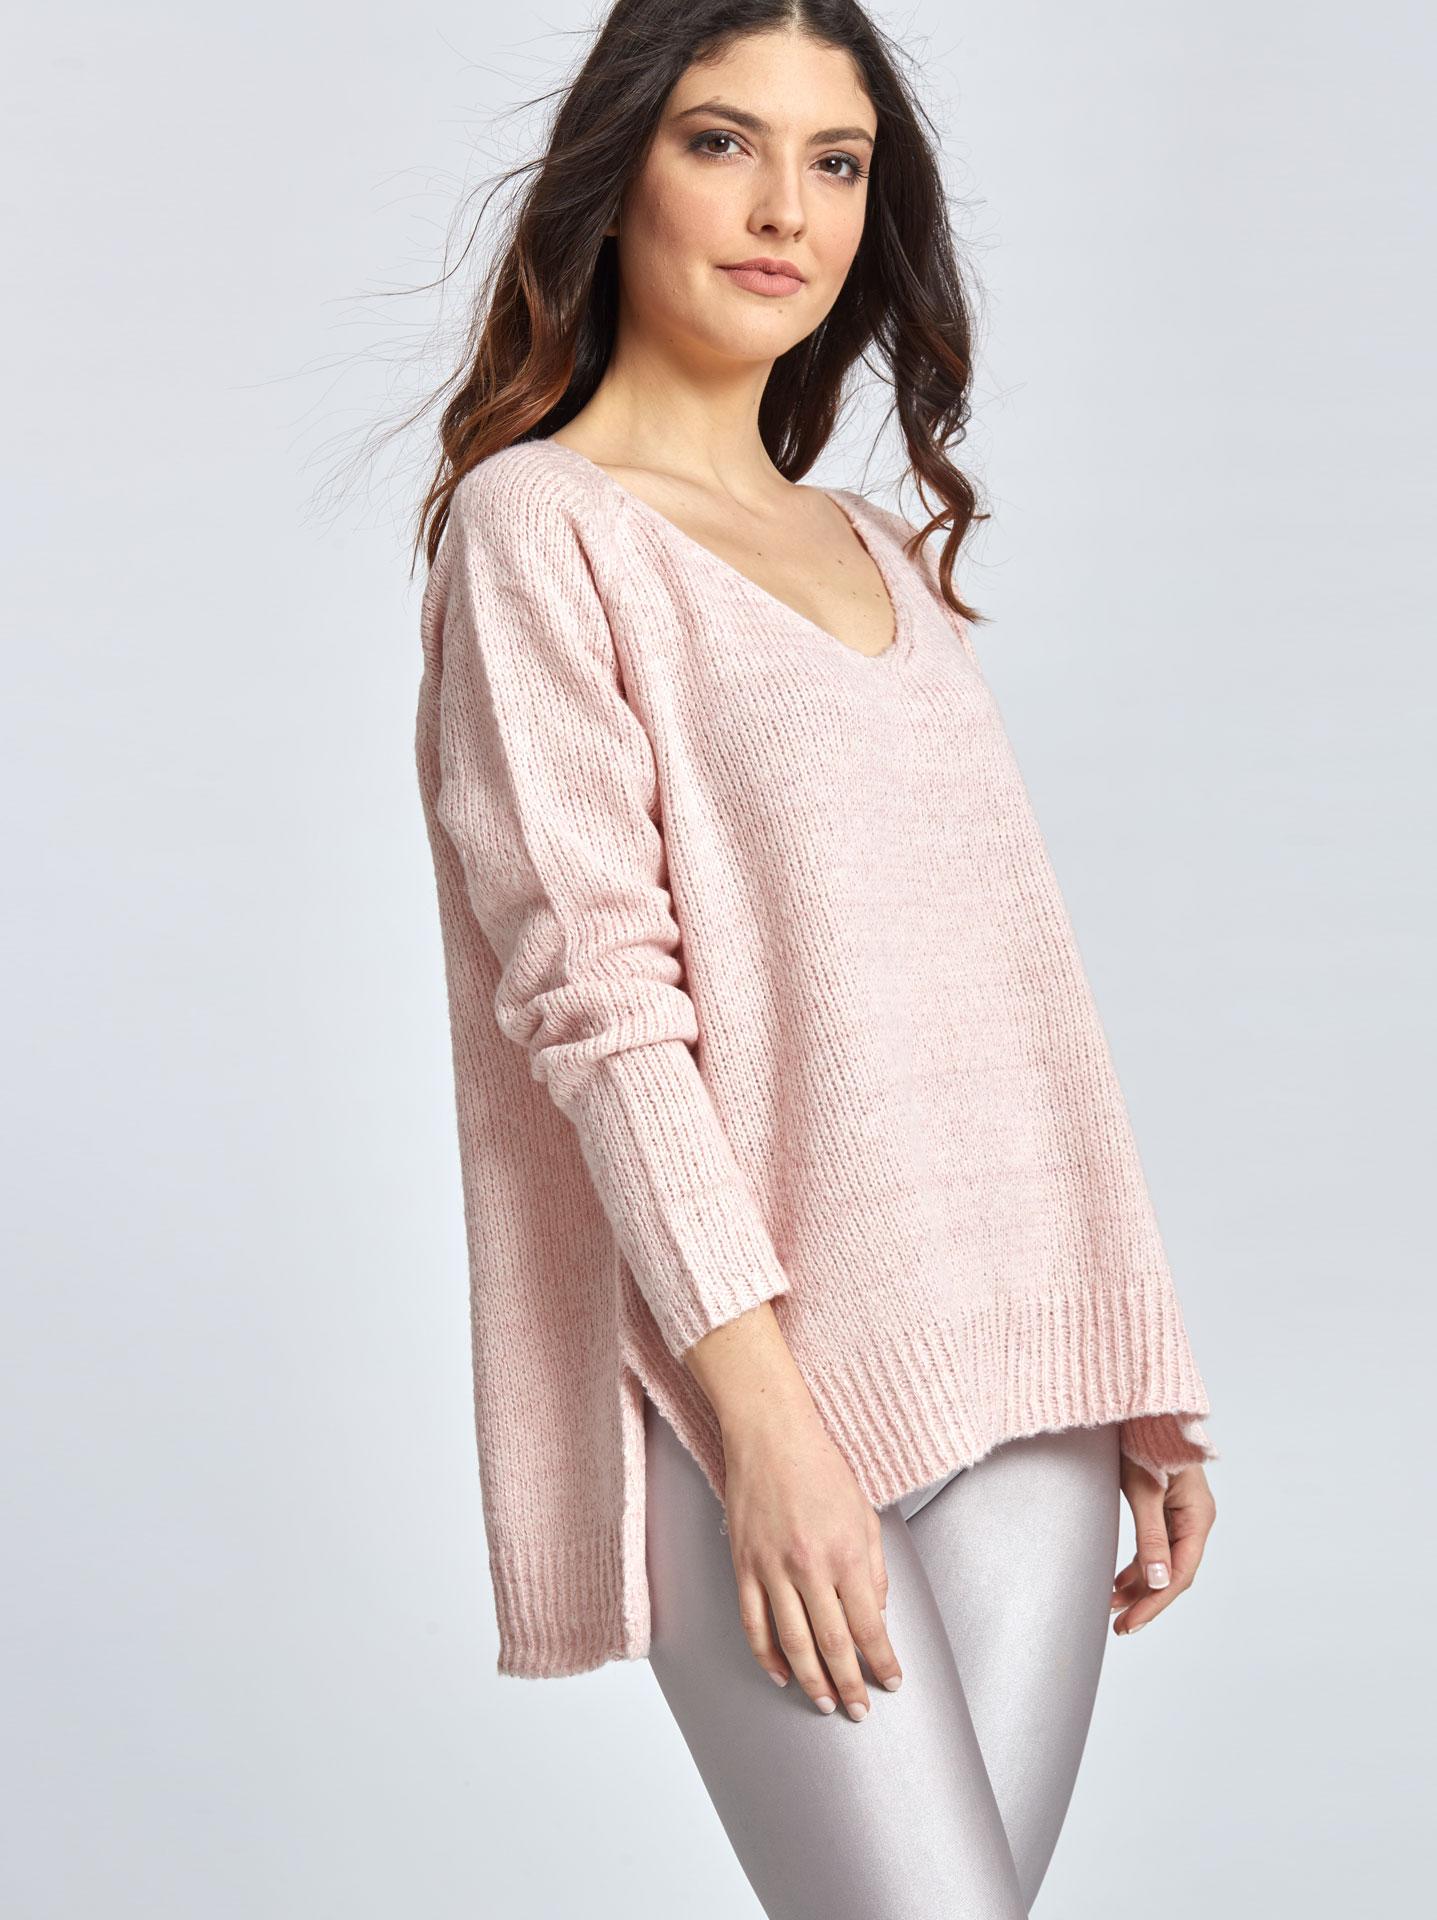 d2477487b2cc Πλεκτό πουλόβερ με μεταλλιζέ λεπτομέρειες σε ροζ